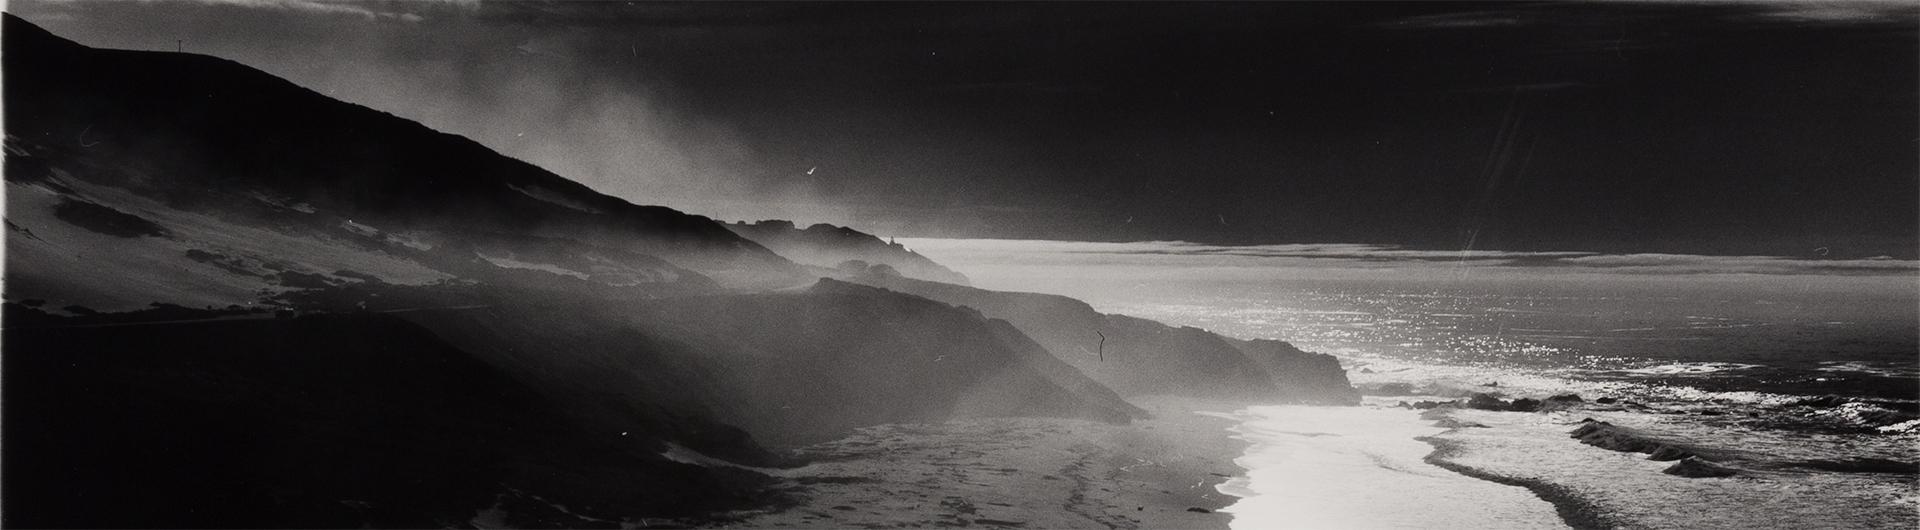 Shoreline black and white photograph